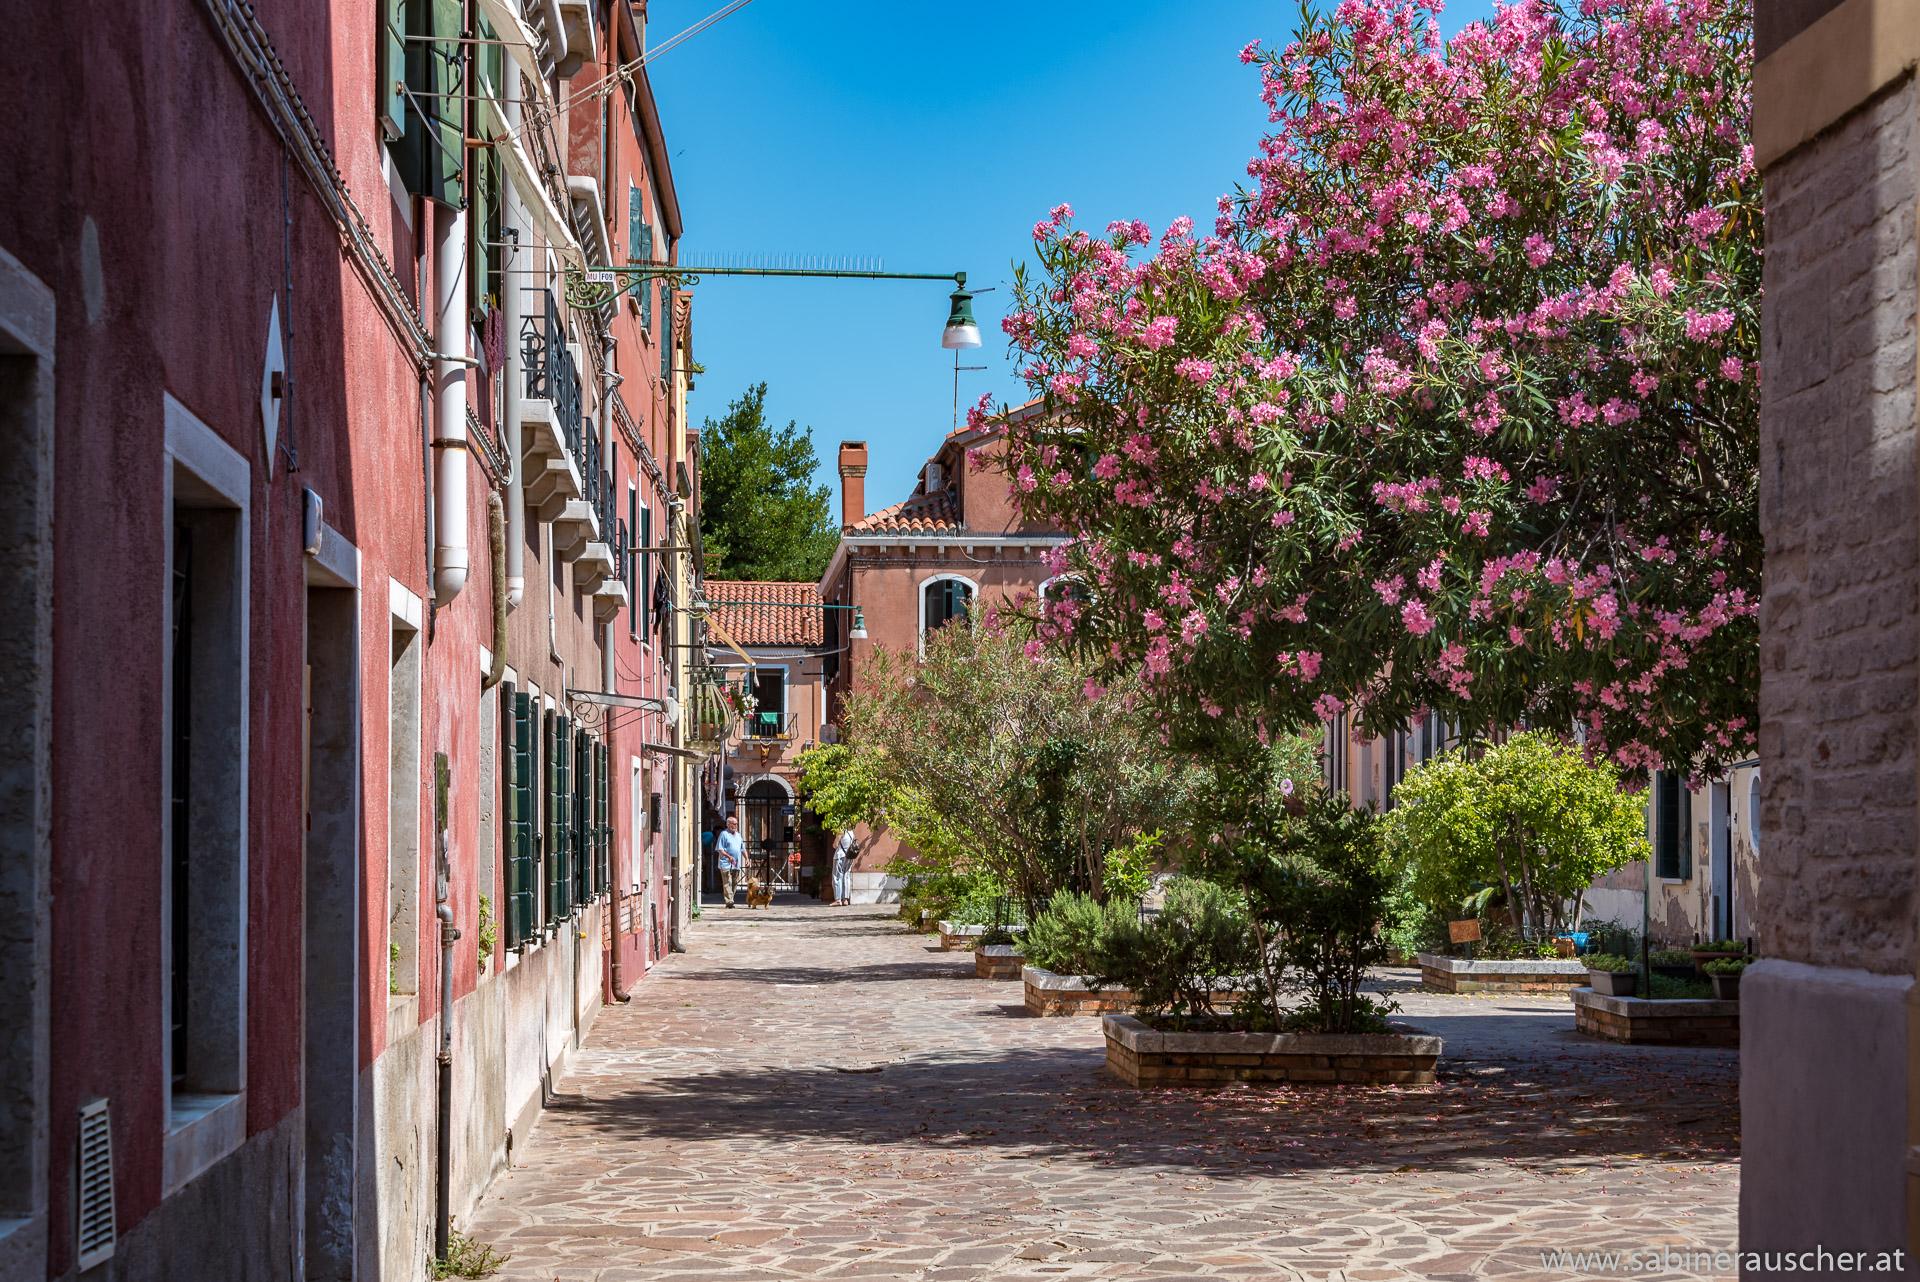 Venice - a tranquil place at Murano | Venedig - ein stiller Platz auf Murano